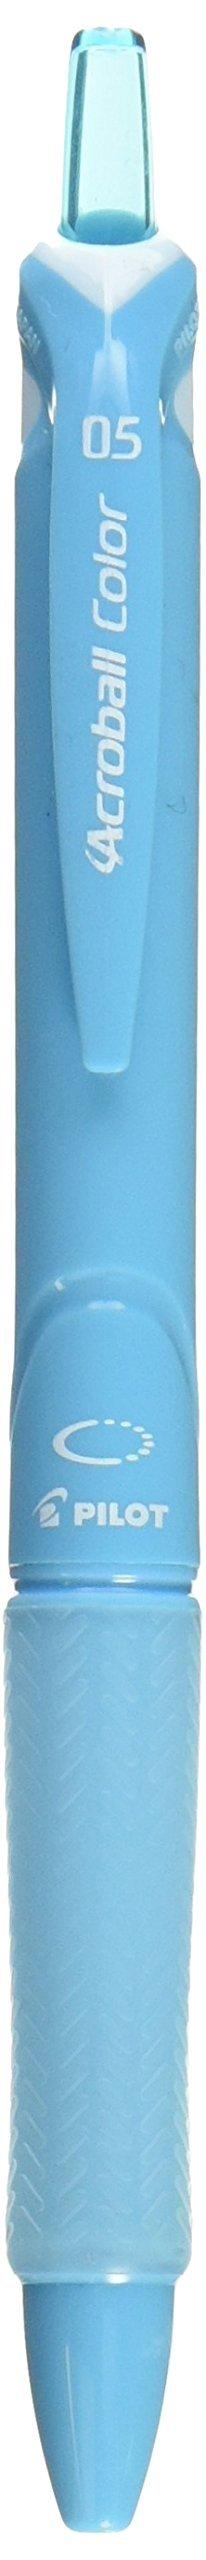 Pilot Acroball Color 150, Knock Color Ink Ballpoint [0FVM1XT4]